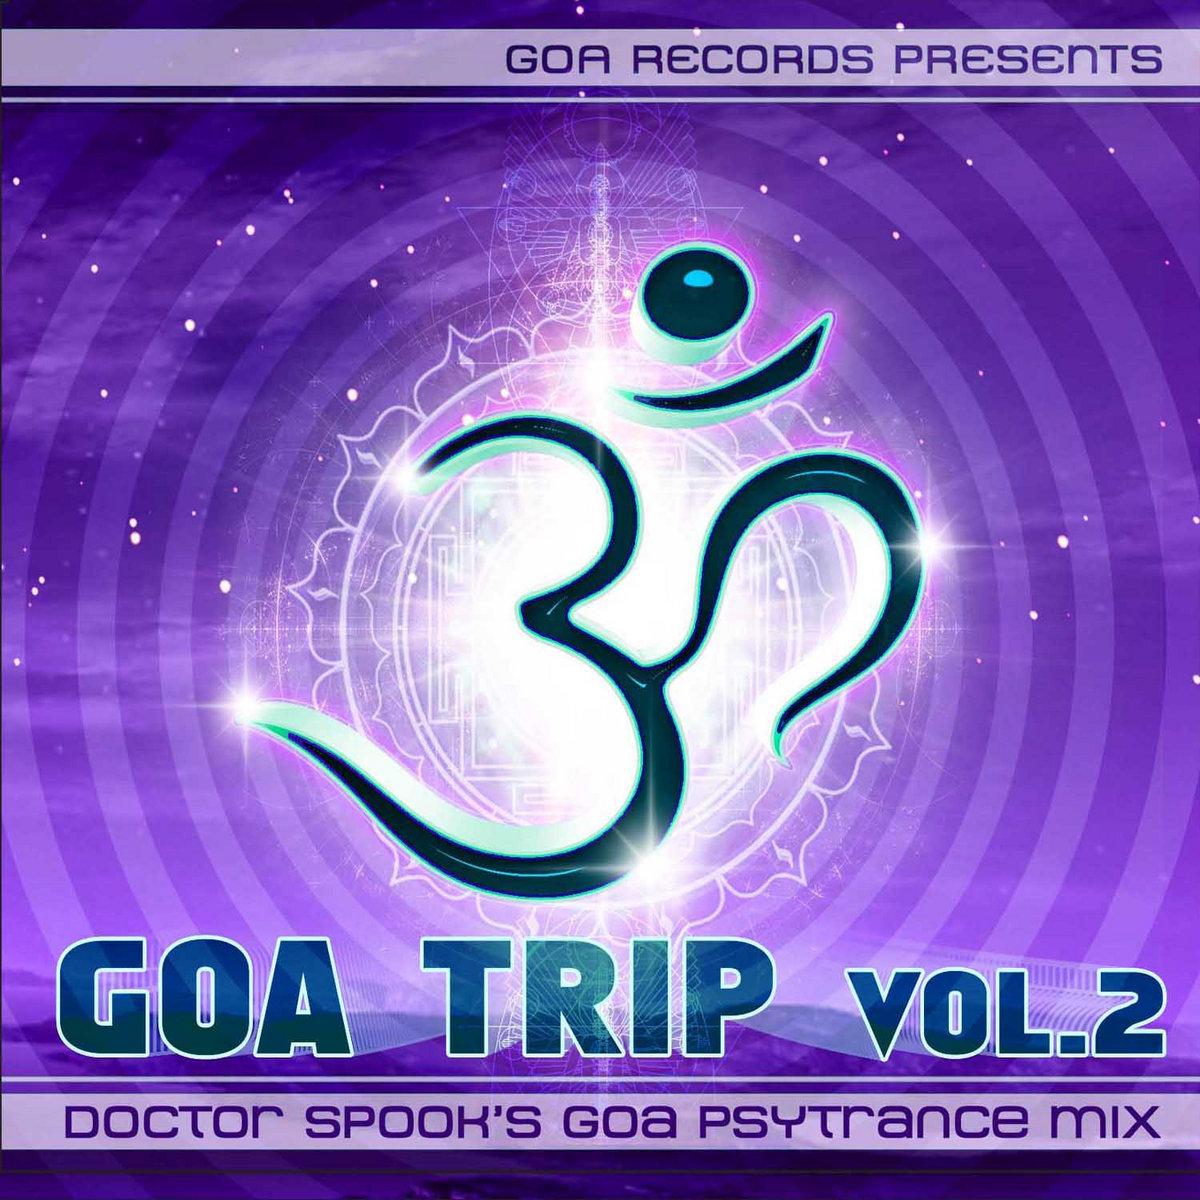 GOA TRIP vol2 goarec006 - Doctor Spook's Goa Psytrance Mix – GOA